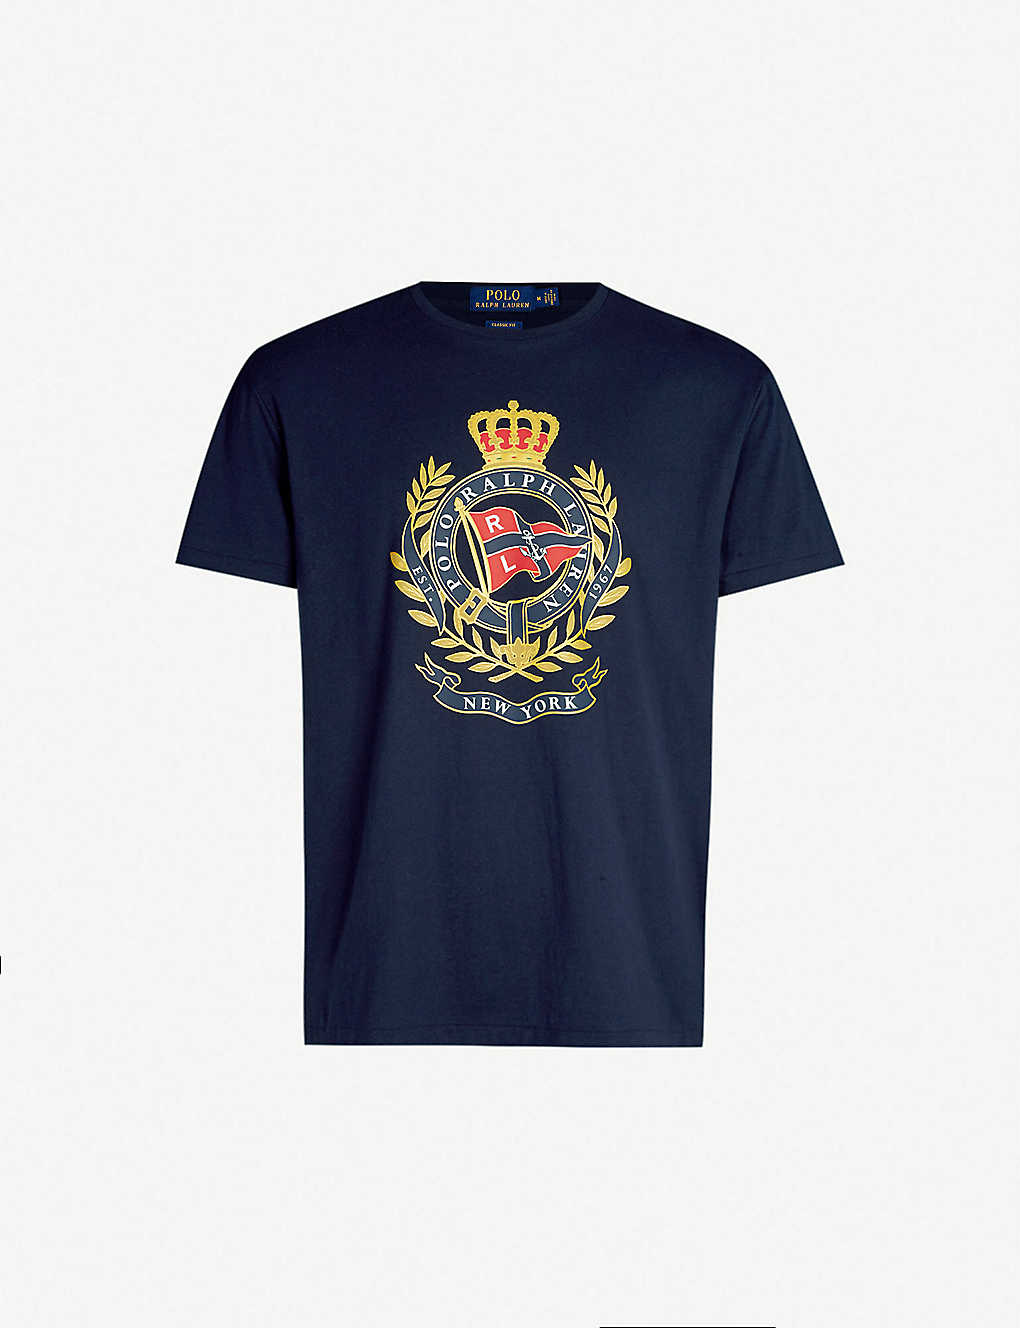 Jersey Graphic Shirt Print Cotton T sQChxrdBto